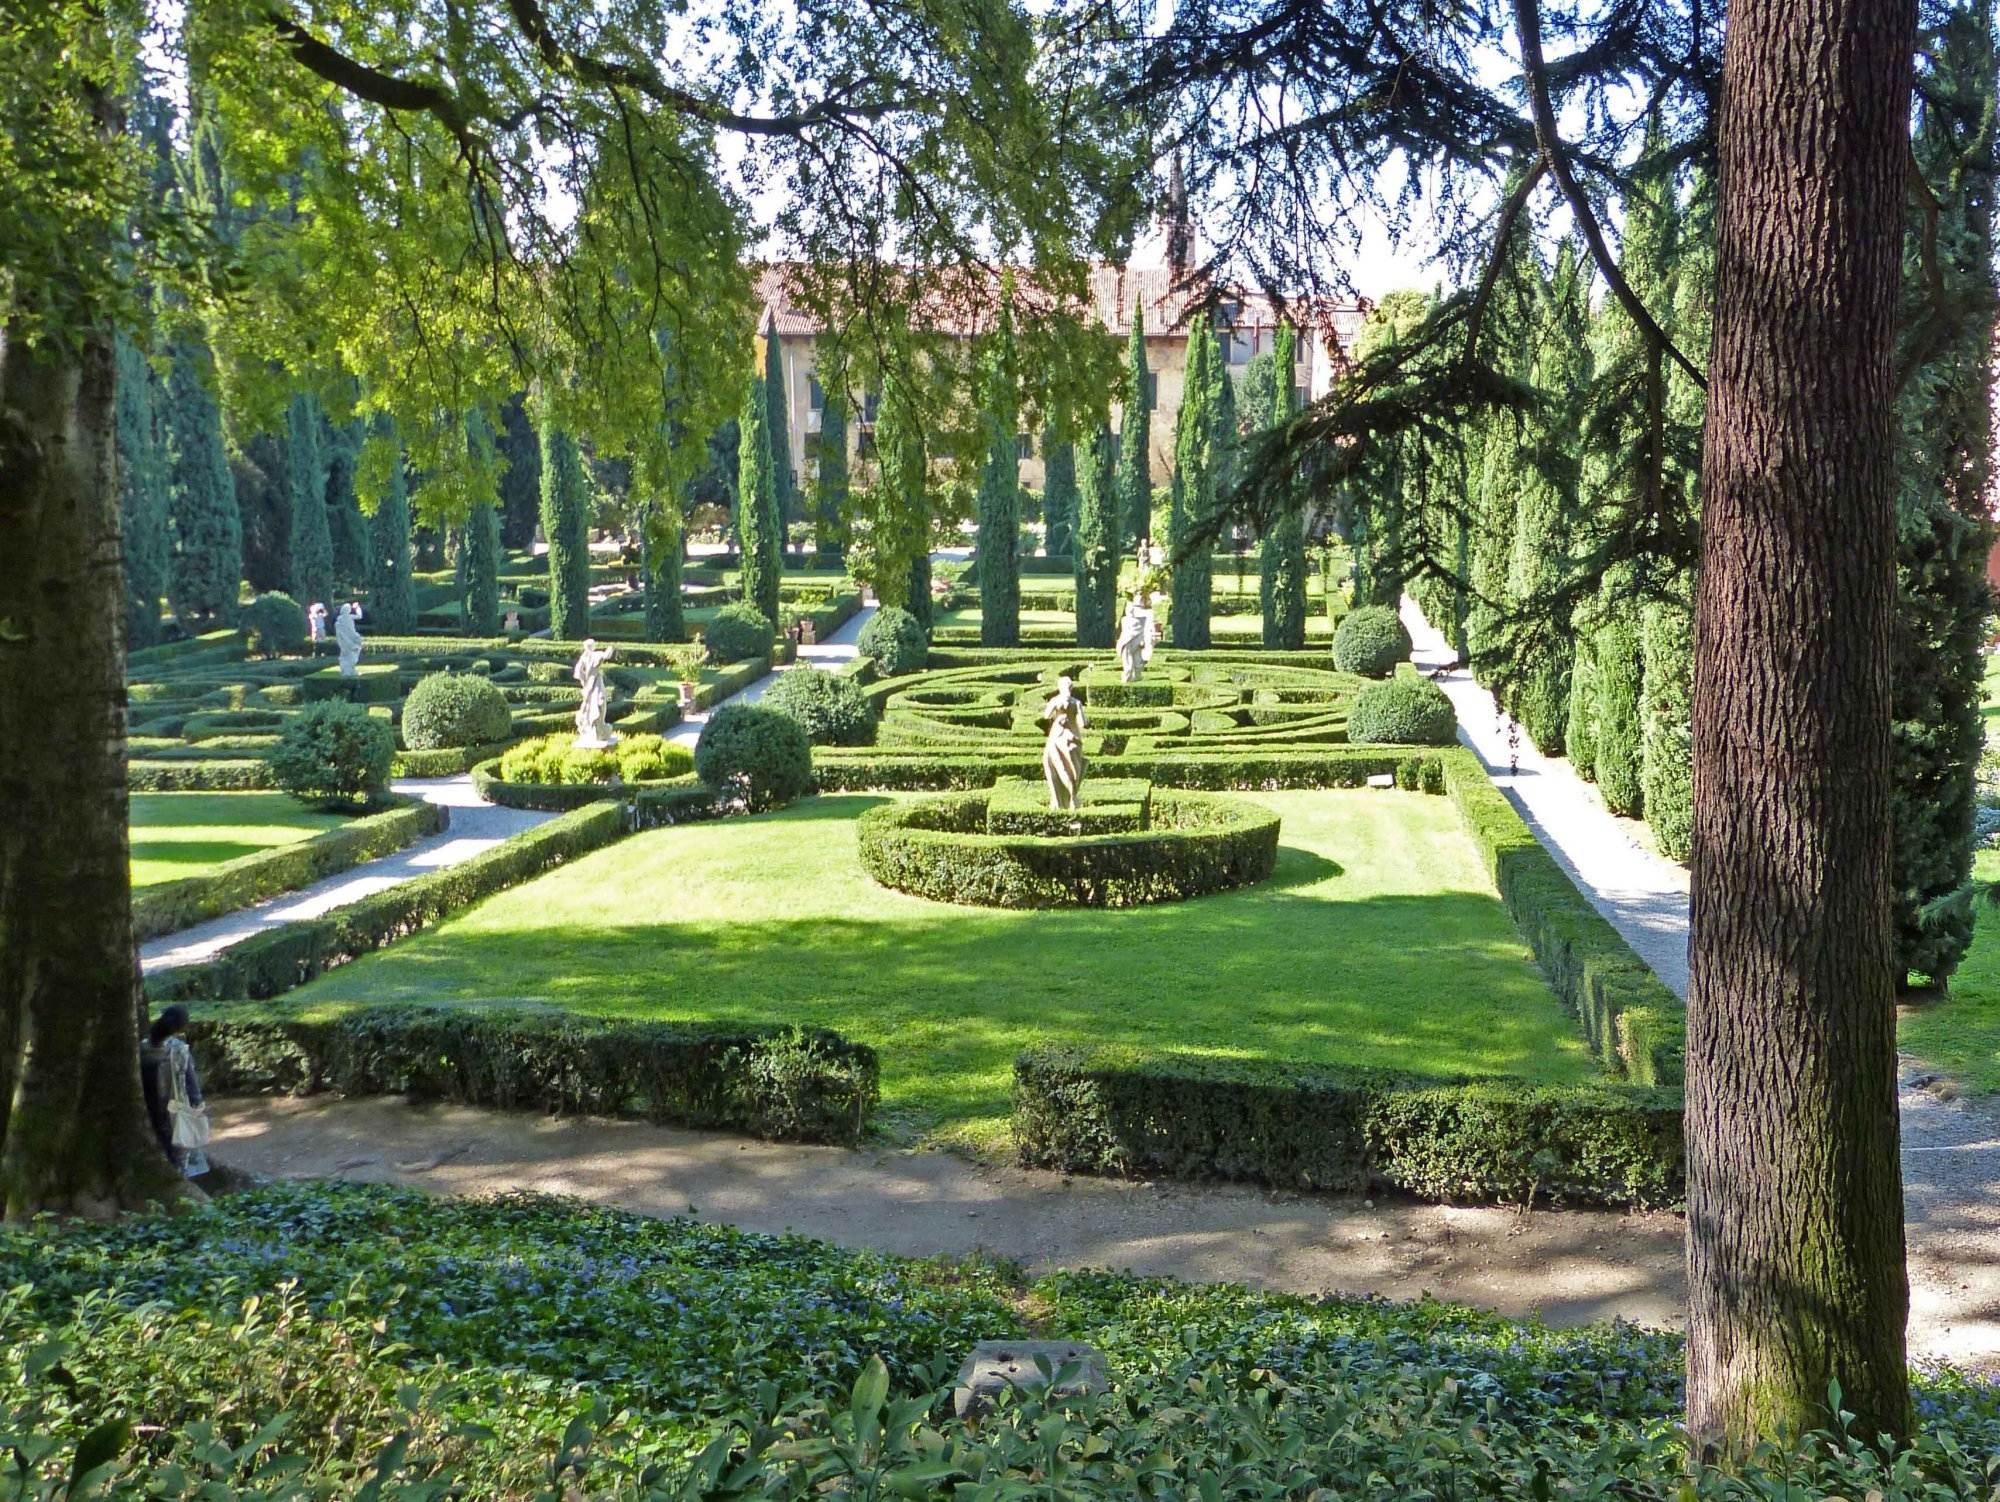 Berühmte gärten u giardino giusti in verona raempel